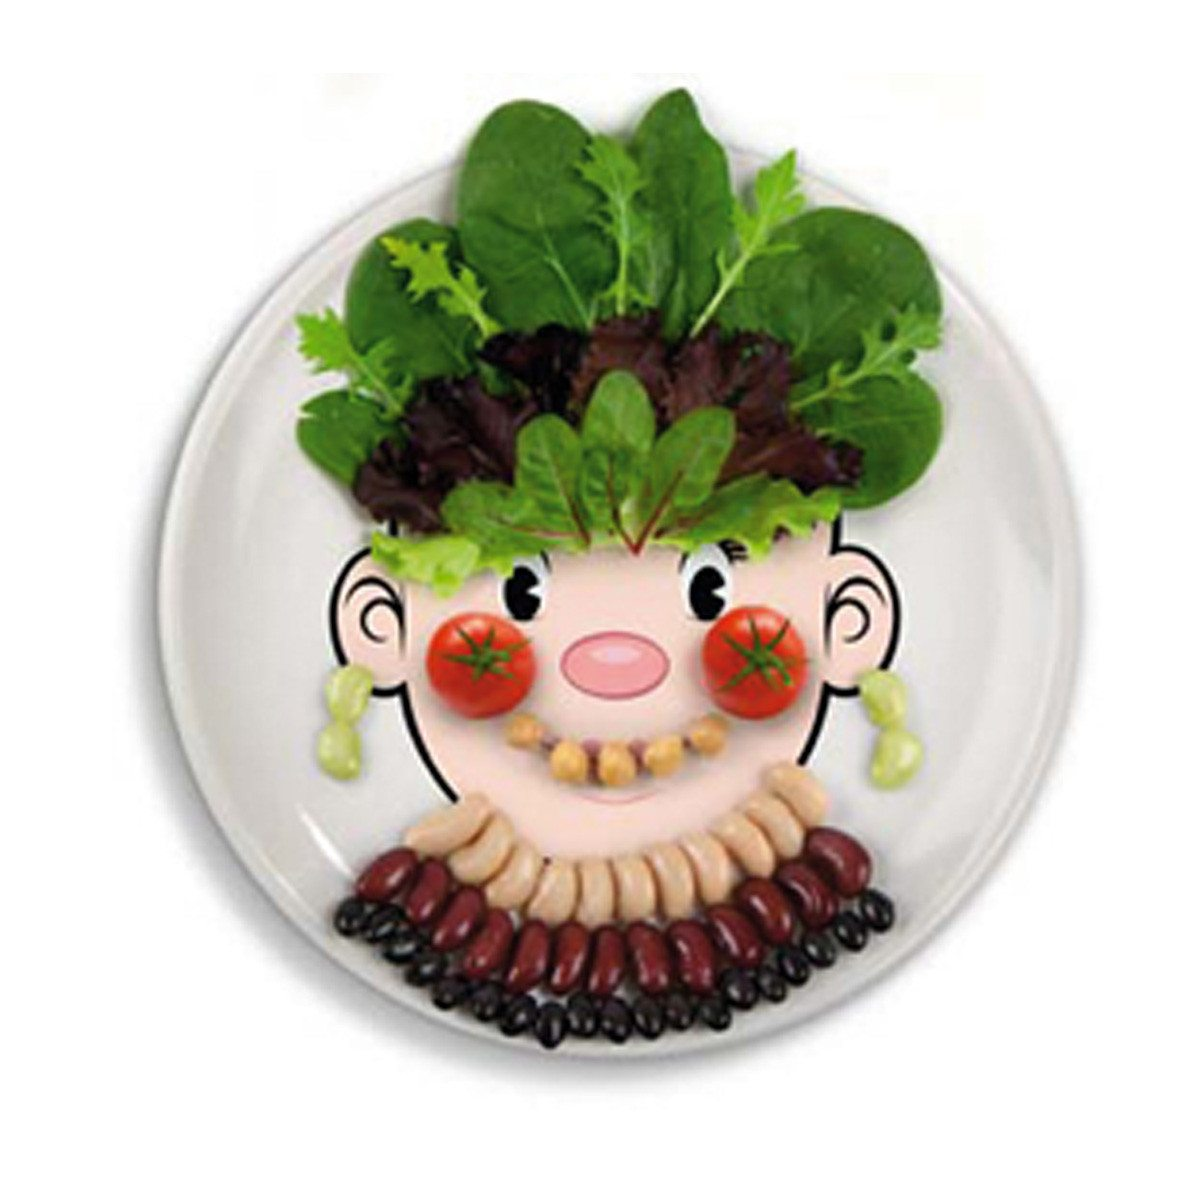 Food Face Teller